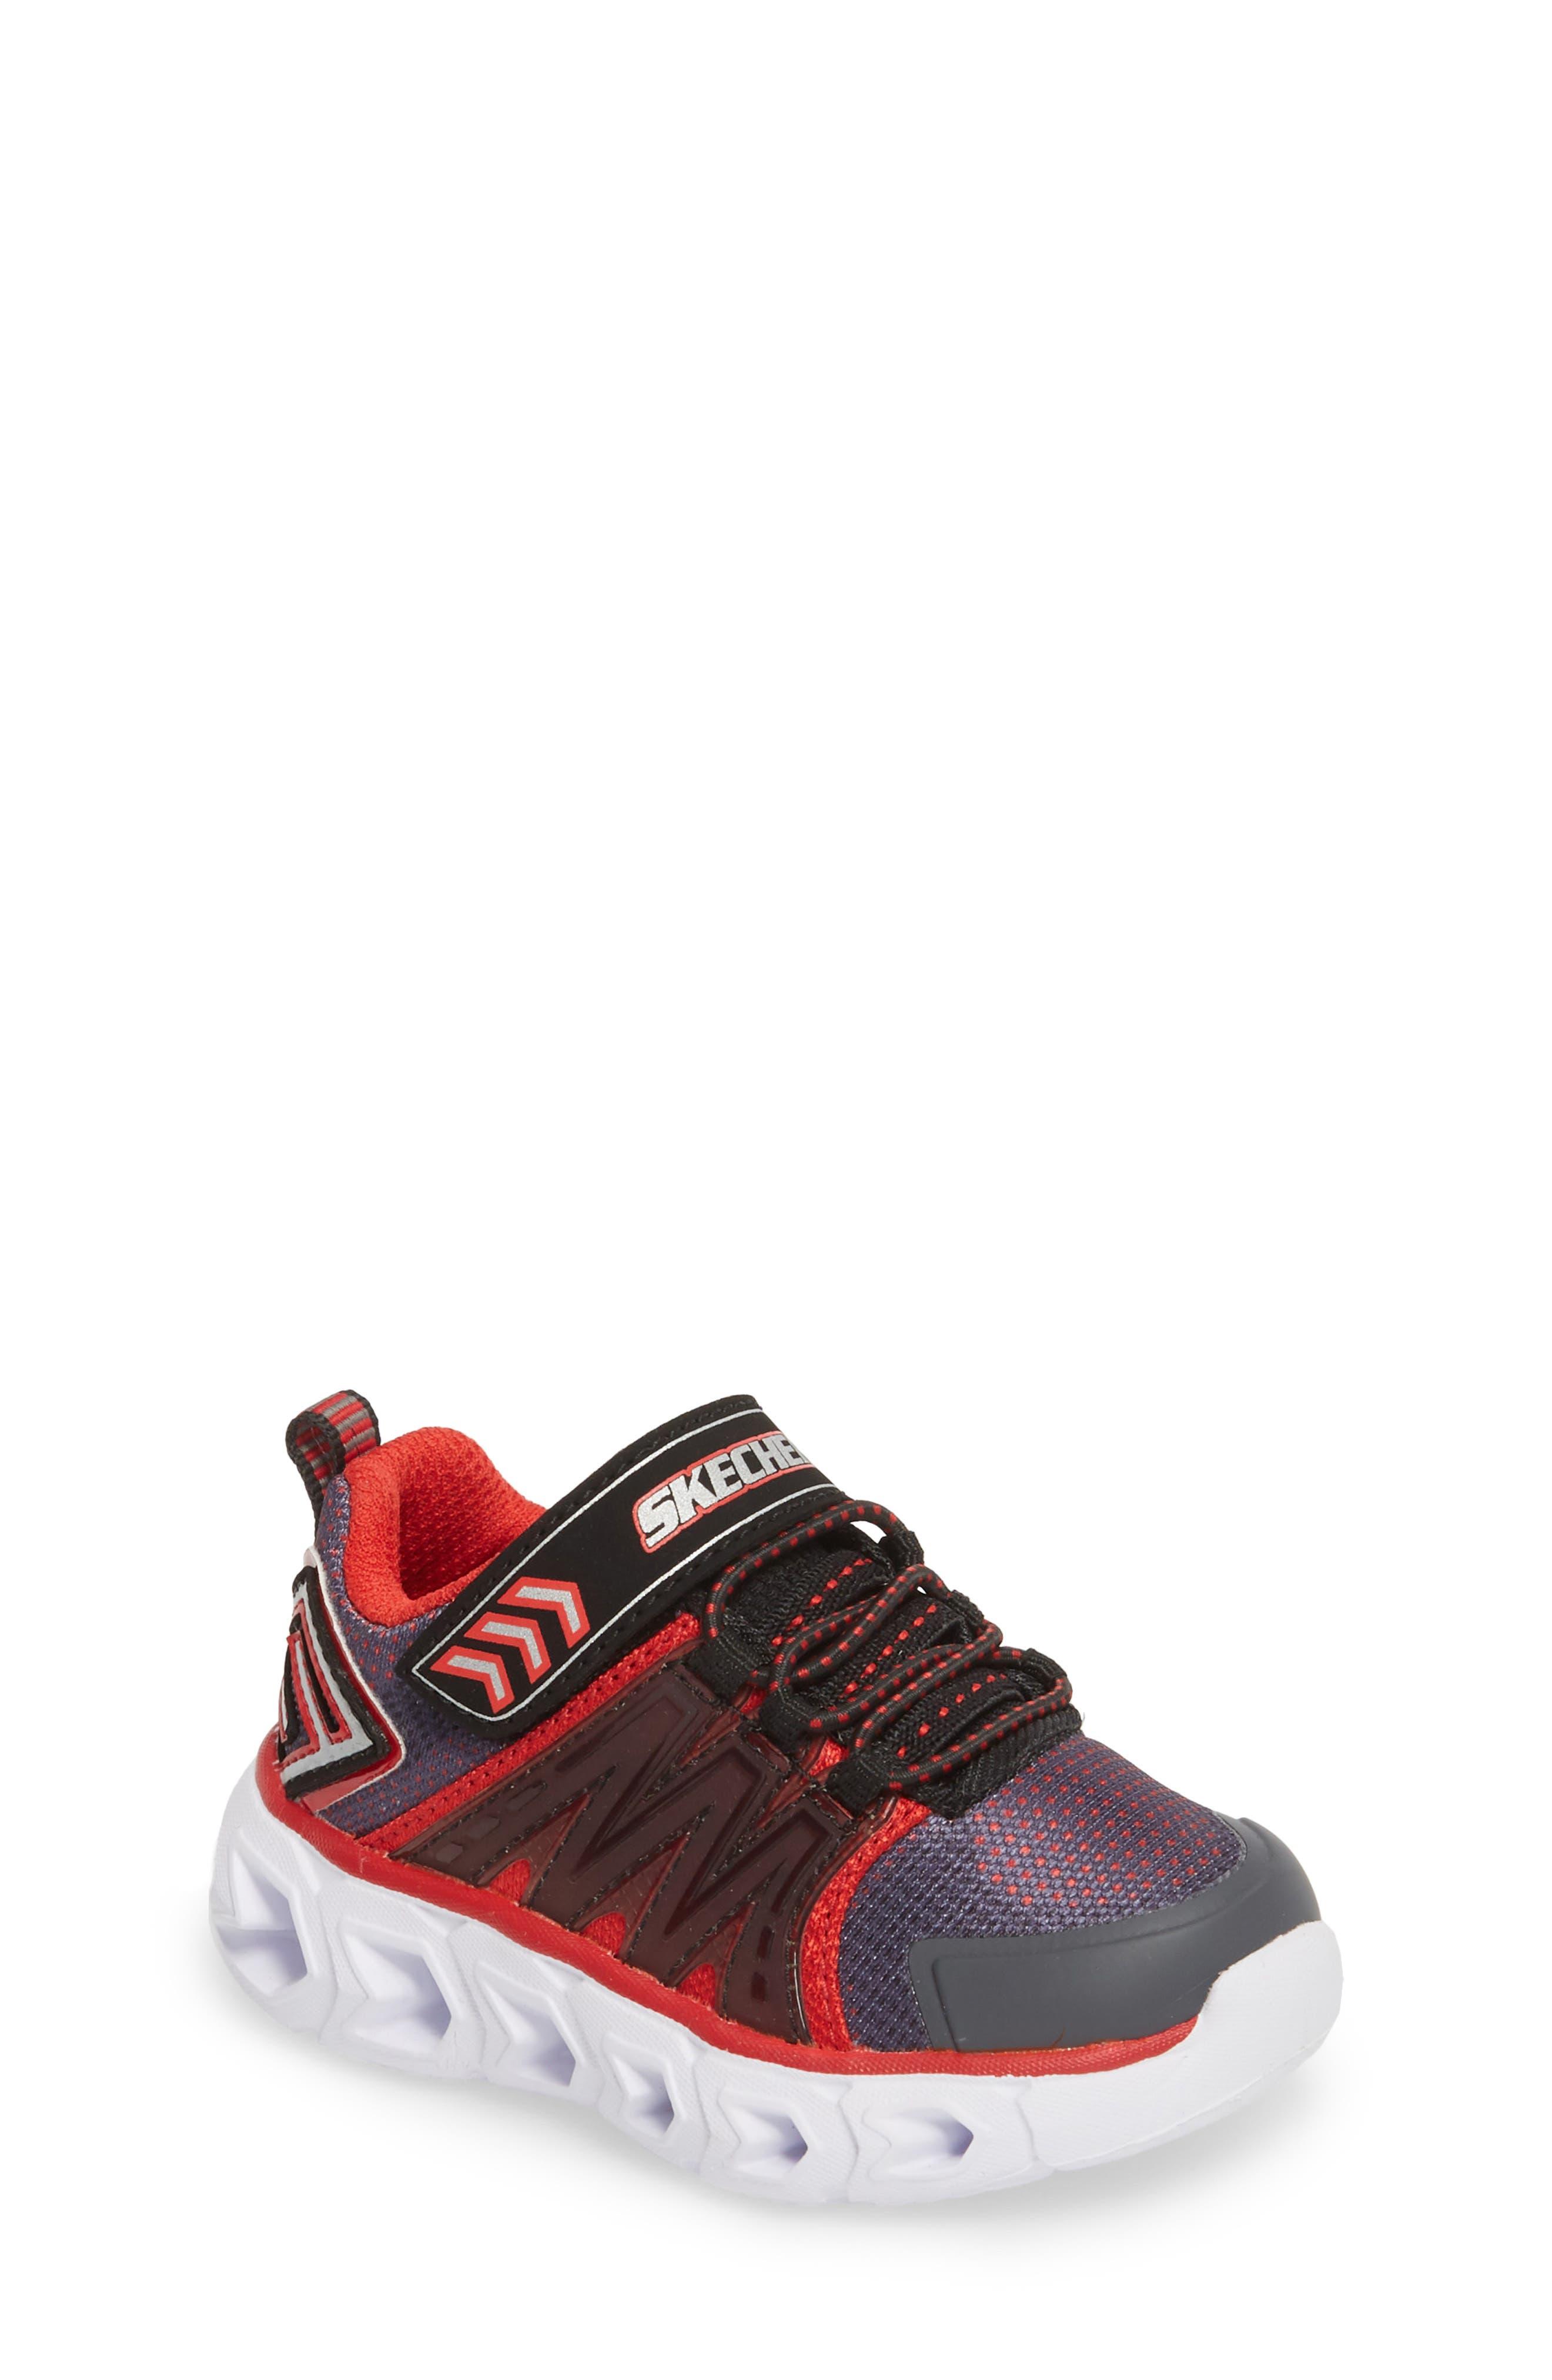 Hypno-Flash 2.0 Sneakers,                             Main thumbnail 2, color,